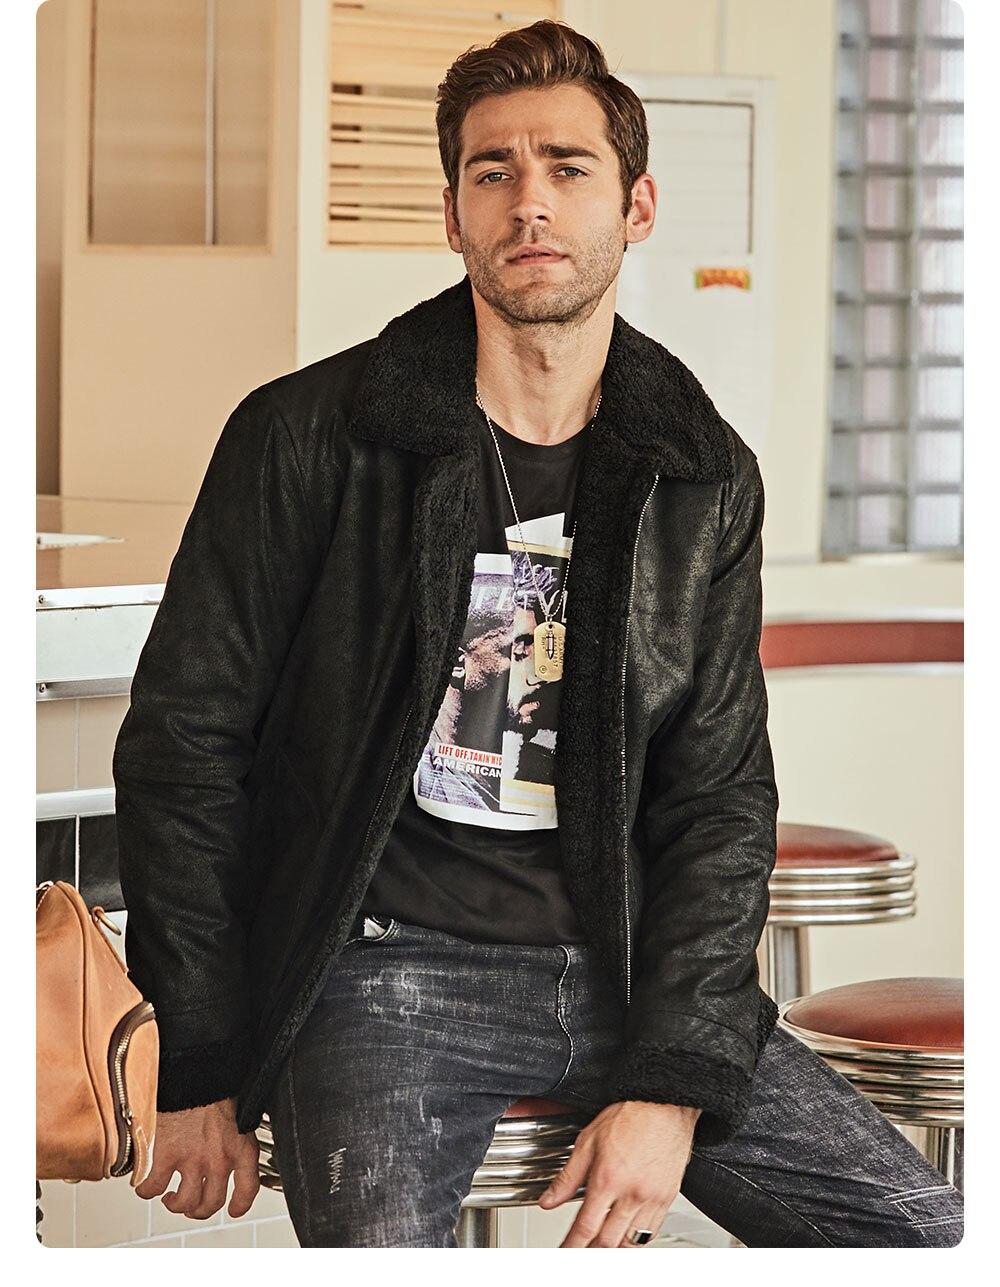 Hfb92c1ac41334045a3b8f70be0e63e14Z New Men's Real Leather Jacket Faux Fur Collar Genuine Leather Jacket